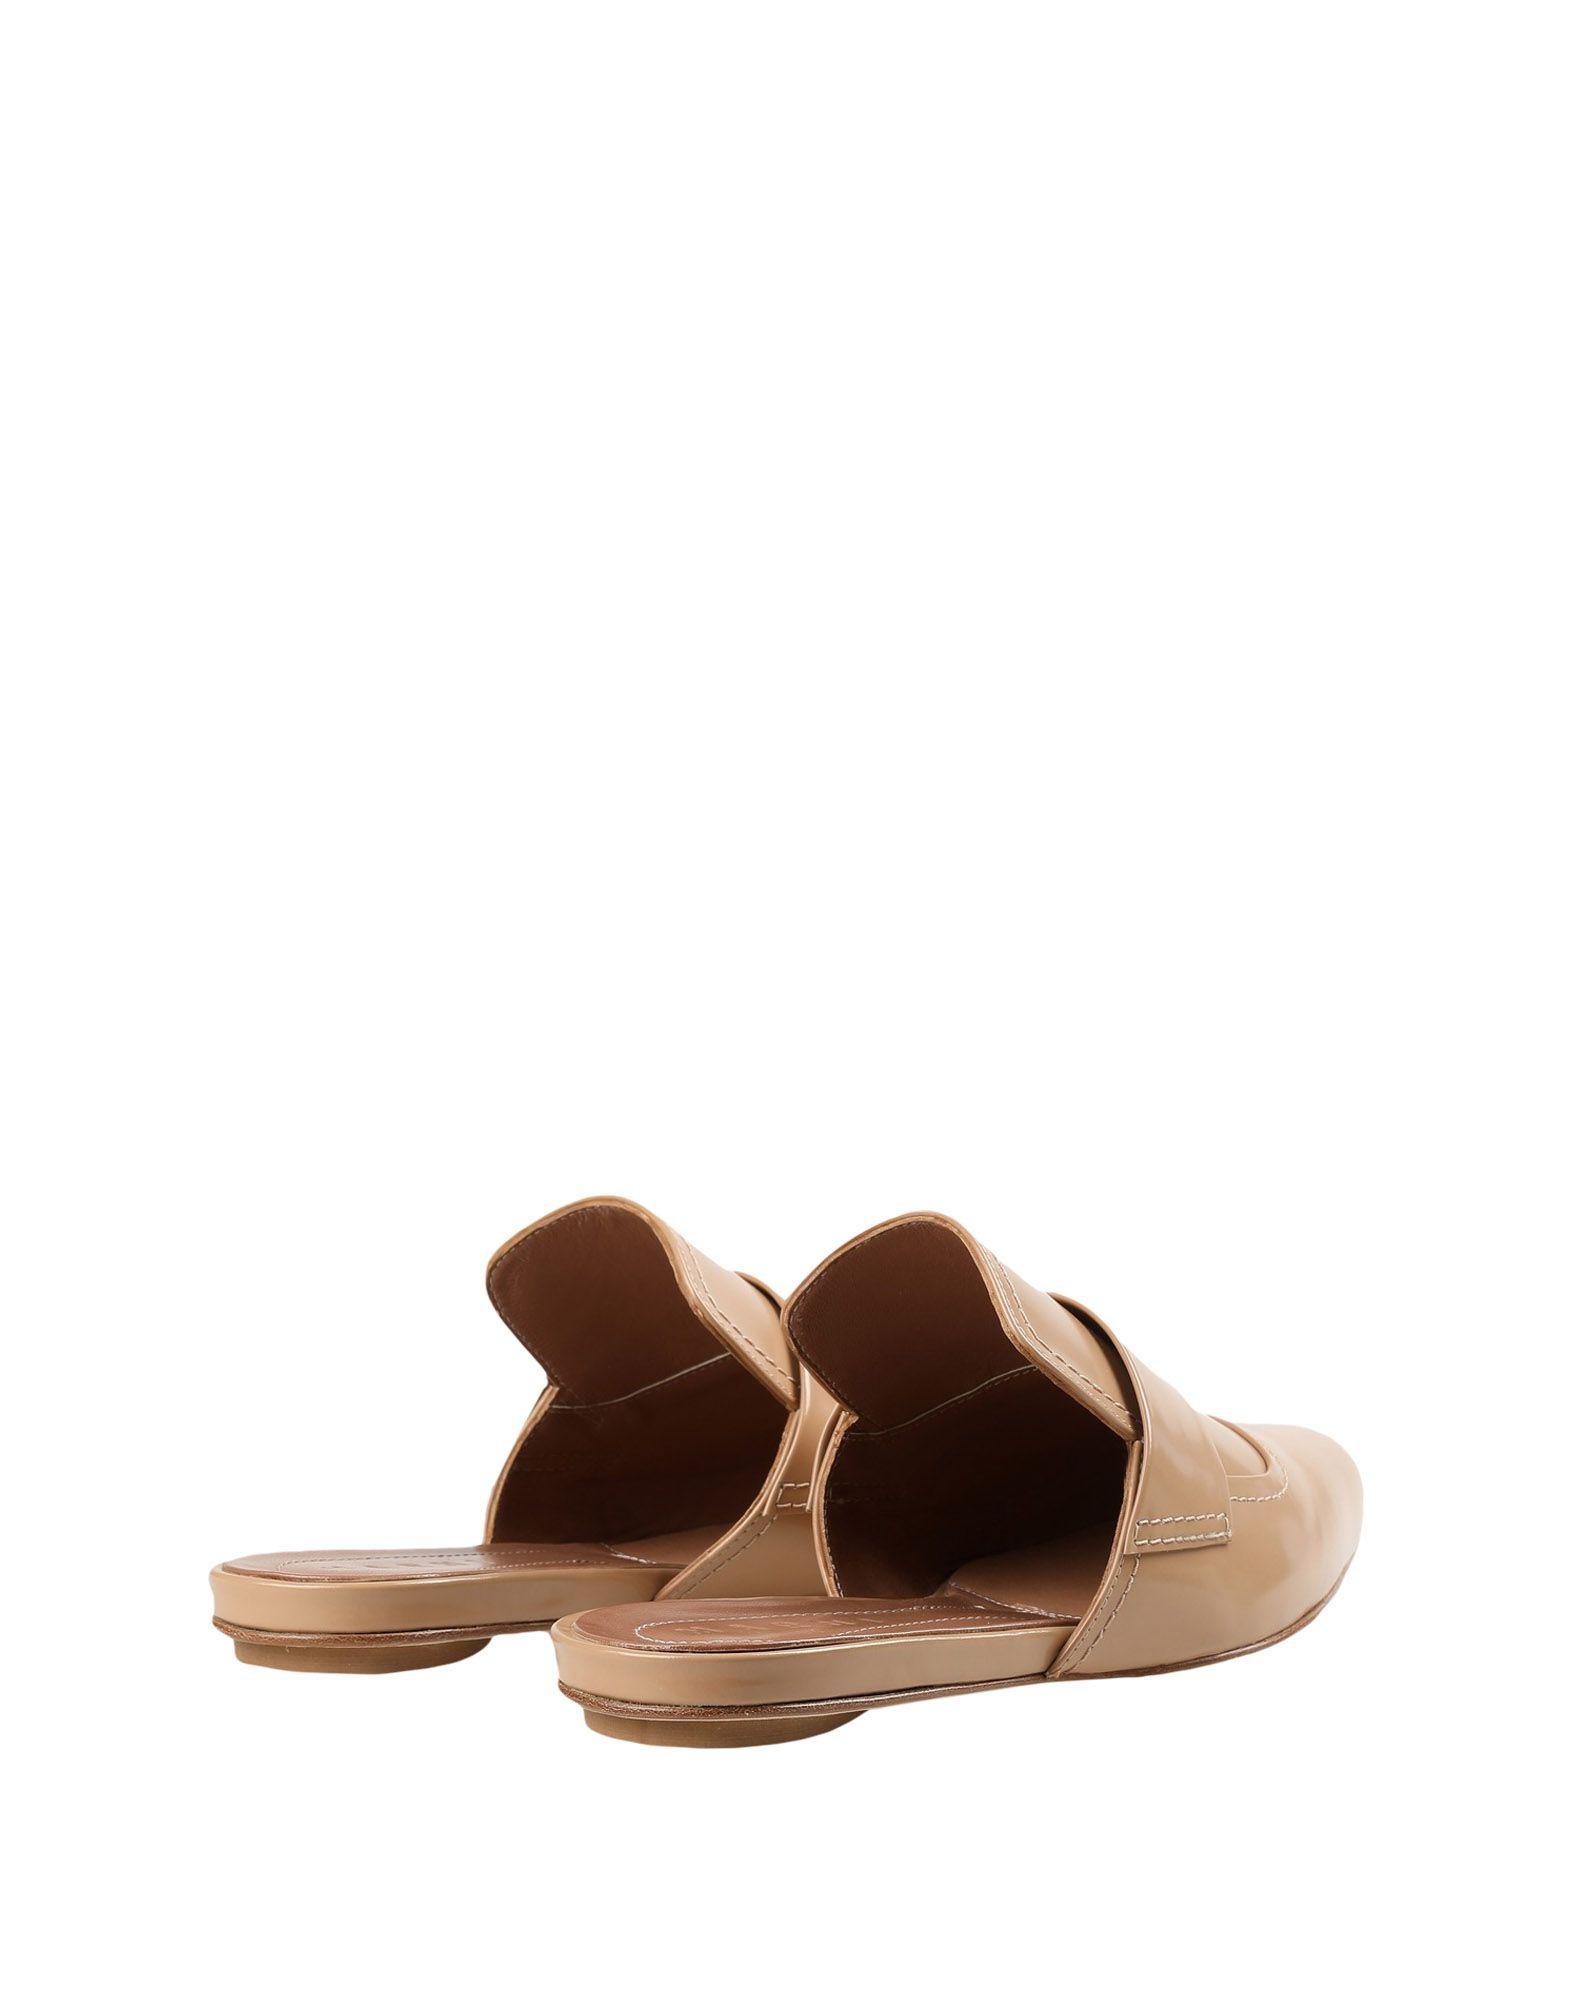 Marni Pantoletten Damen  11511298PXGut Schuhe aussehende strapazierfähige Schuhe 11511298PXGut 869e4f